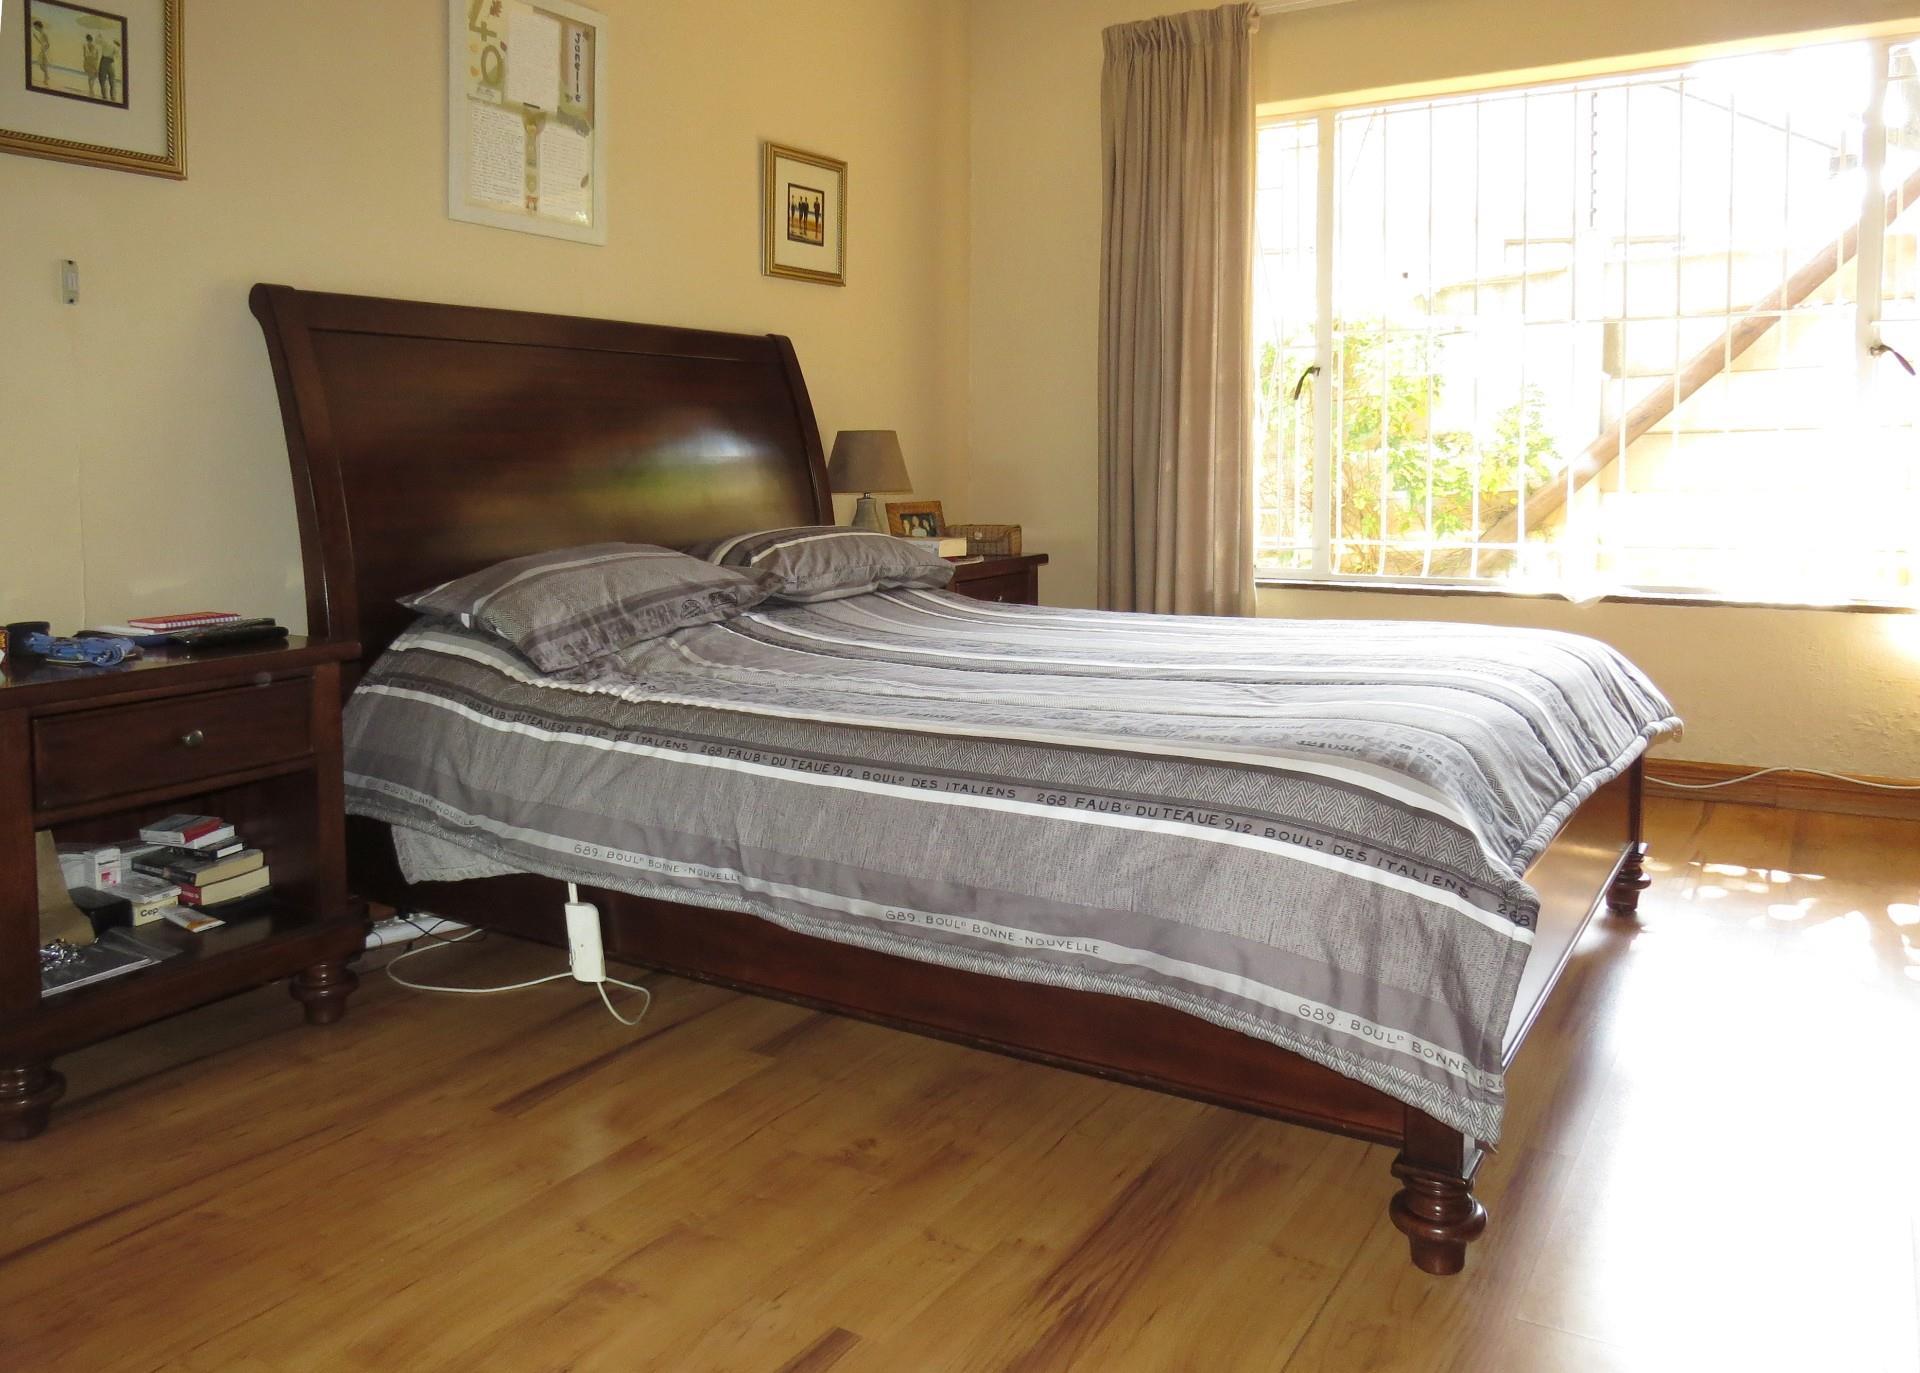 4 Bedroom House For Sale in Beverley Gardens